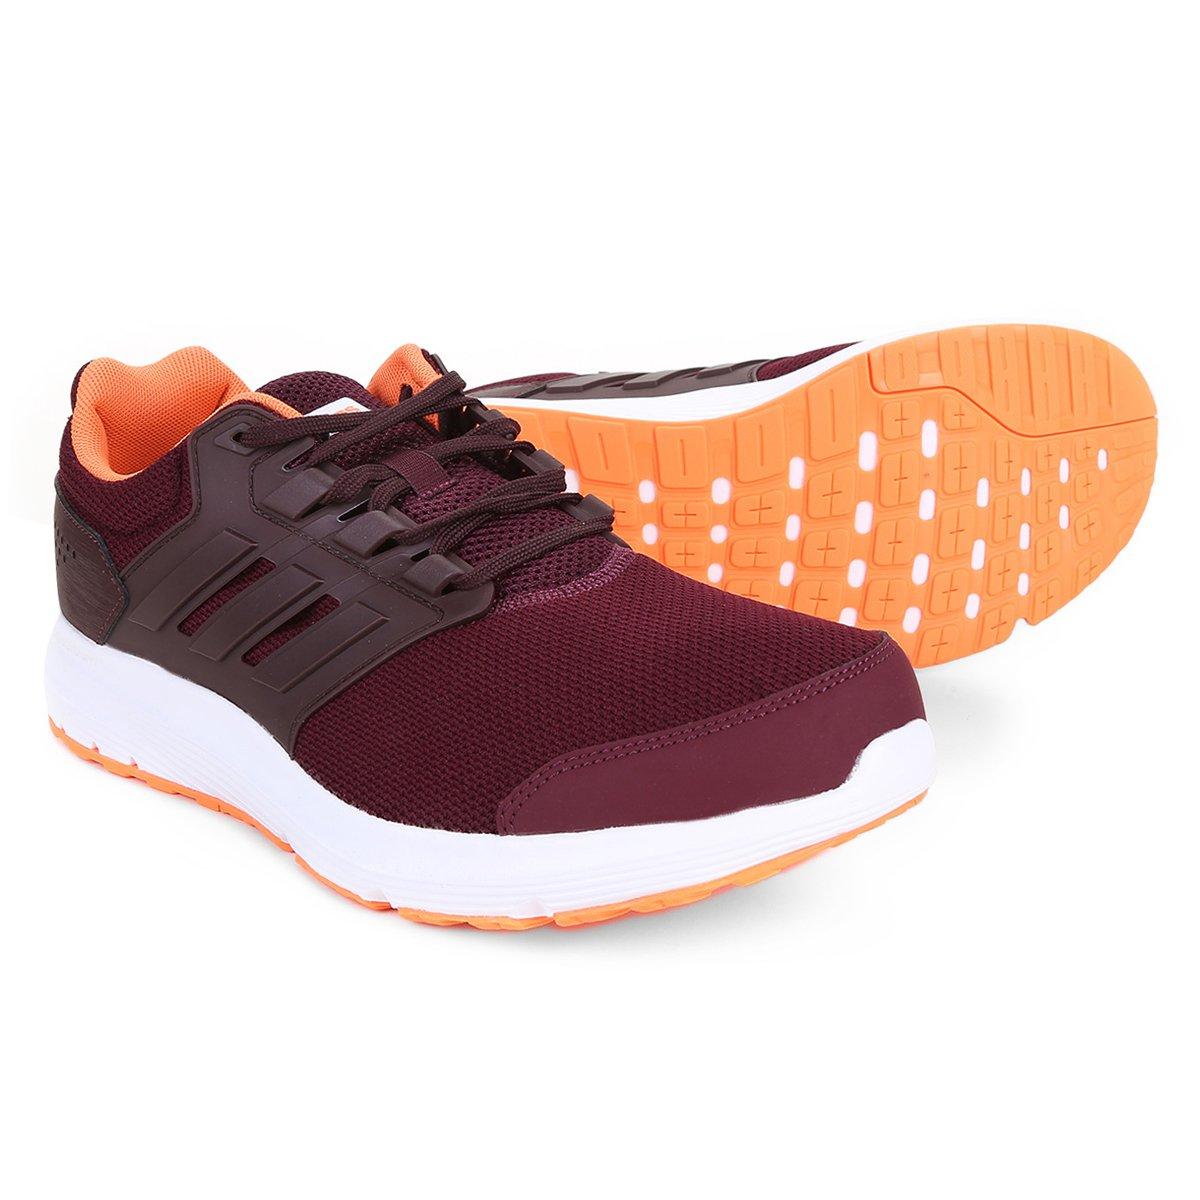 83b62c343 Tênis Adidas Galaxy 4 Masculino - Shopping TudoAzul